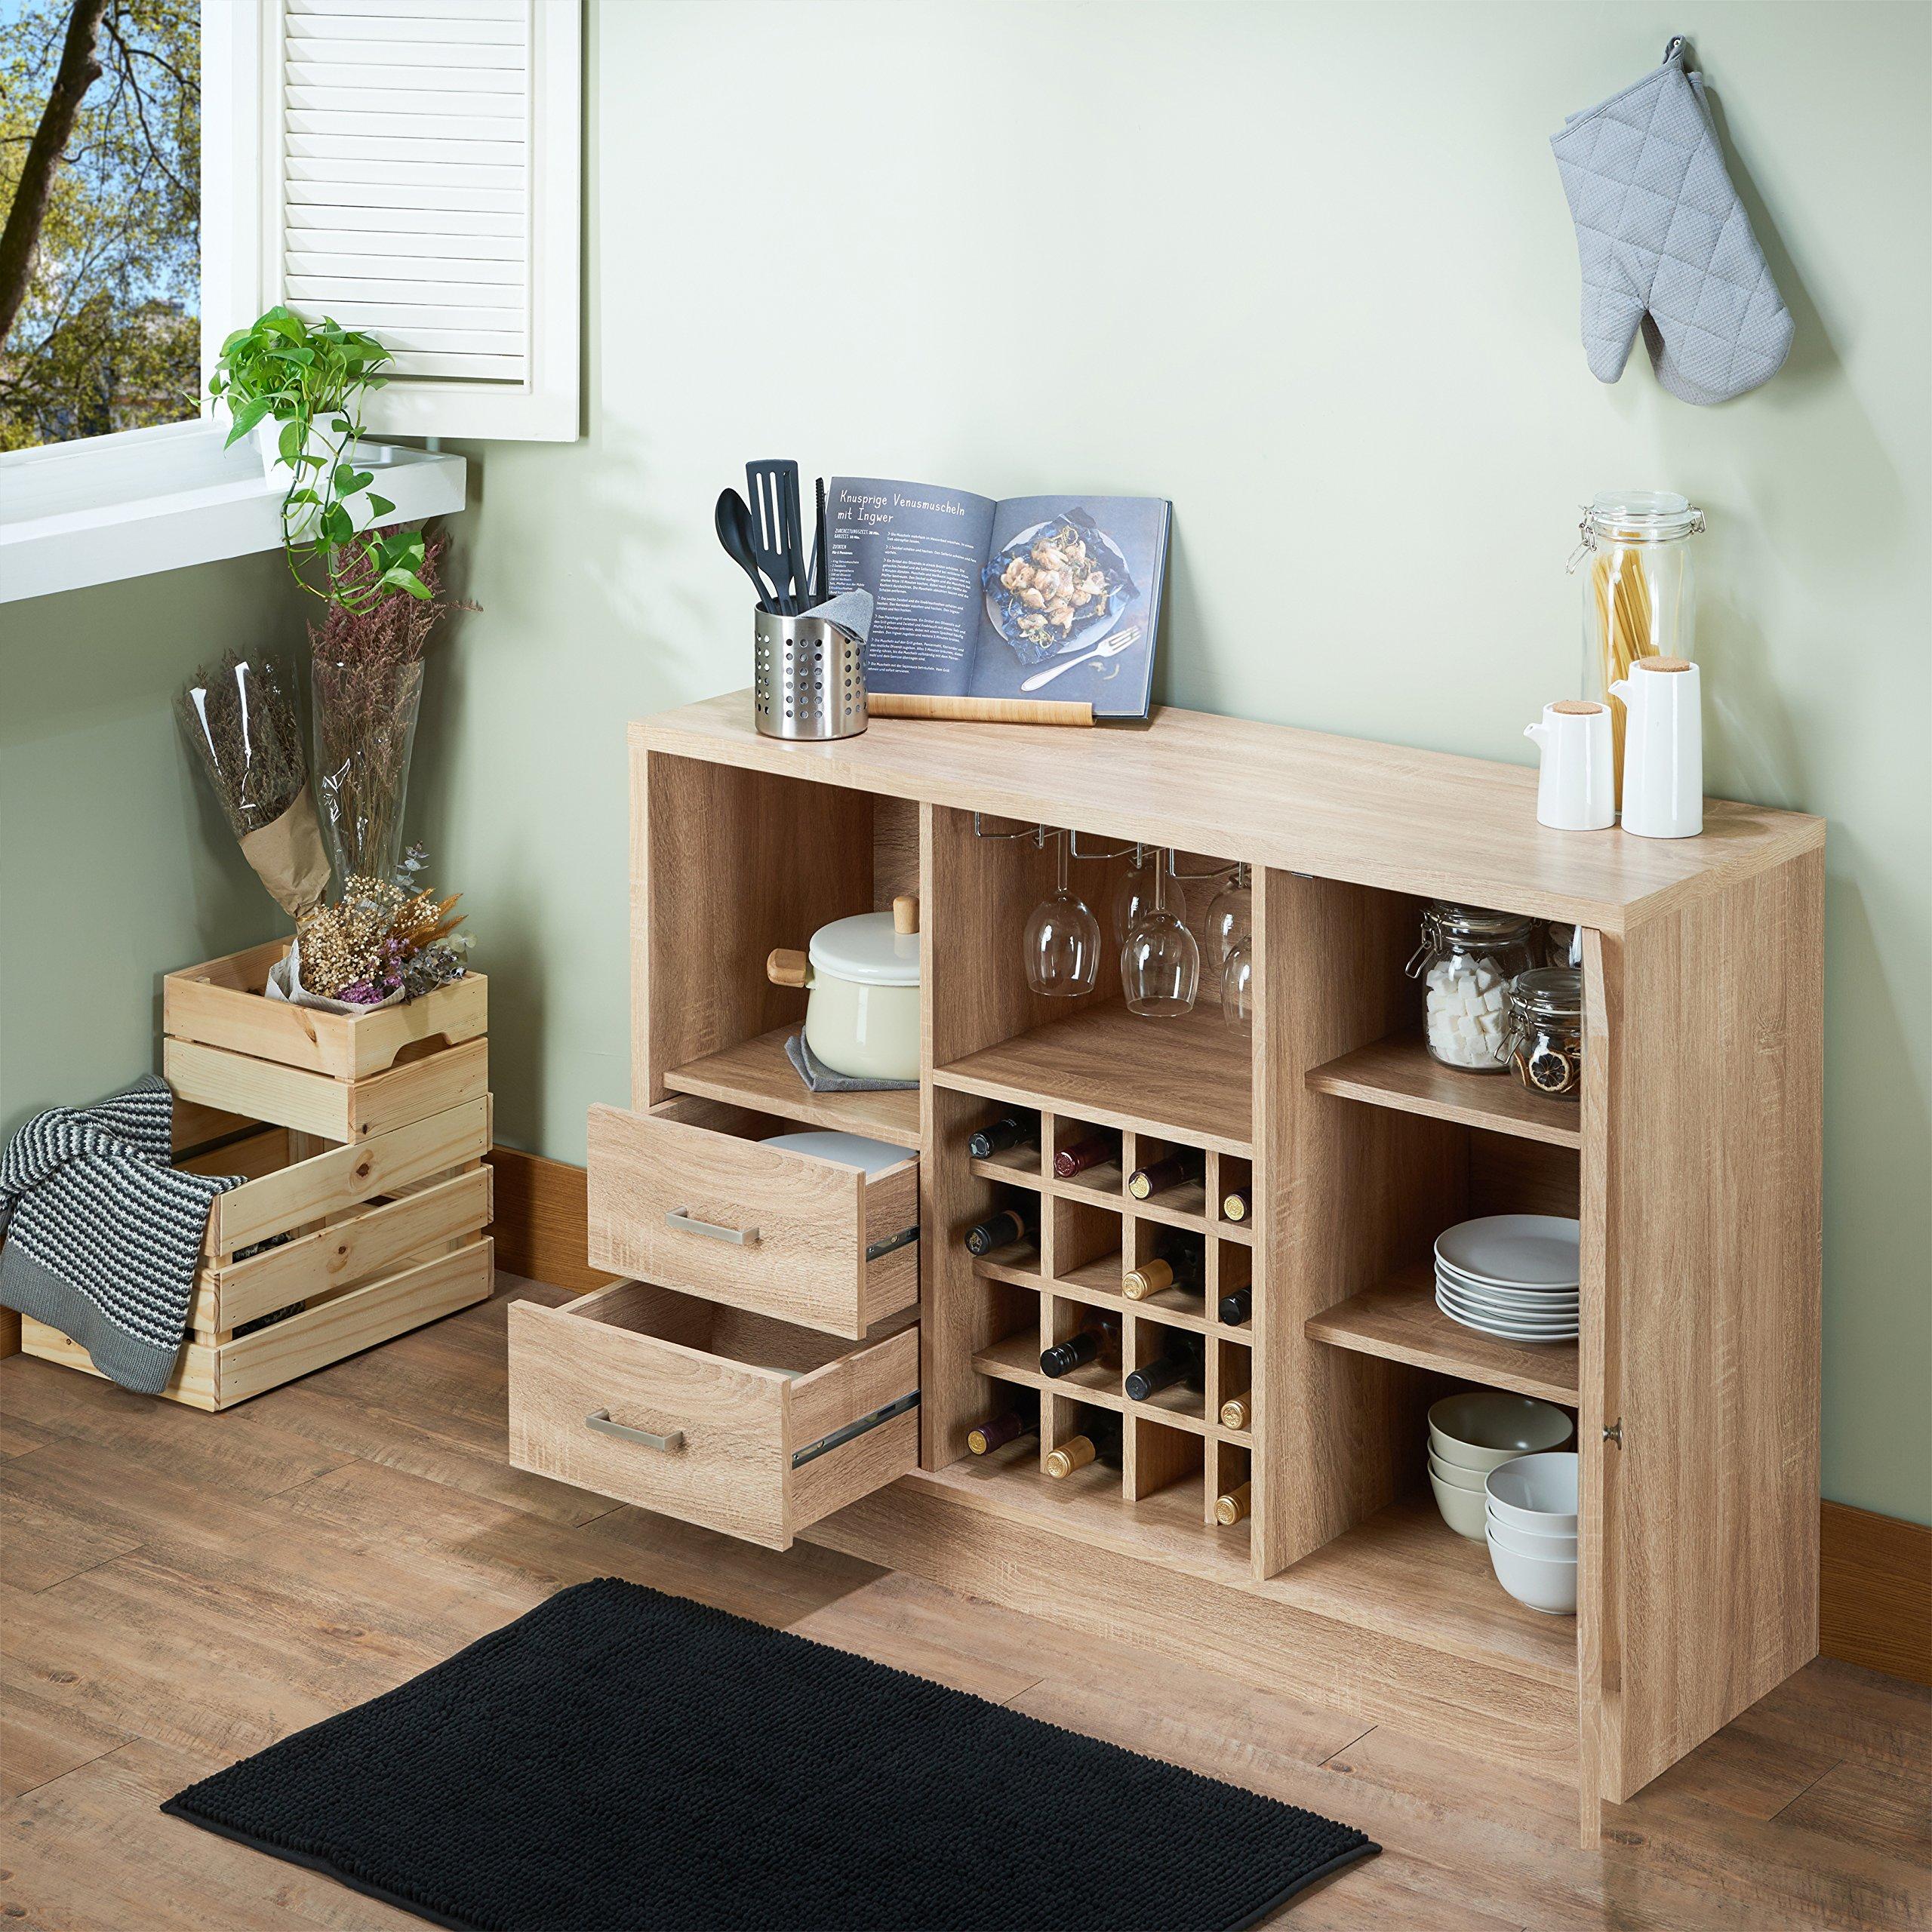 Acme Furniture 72635 Joice Rustic Oak Server by Acme Furniture (Image #7)